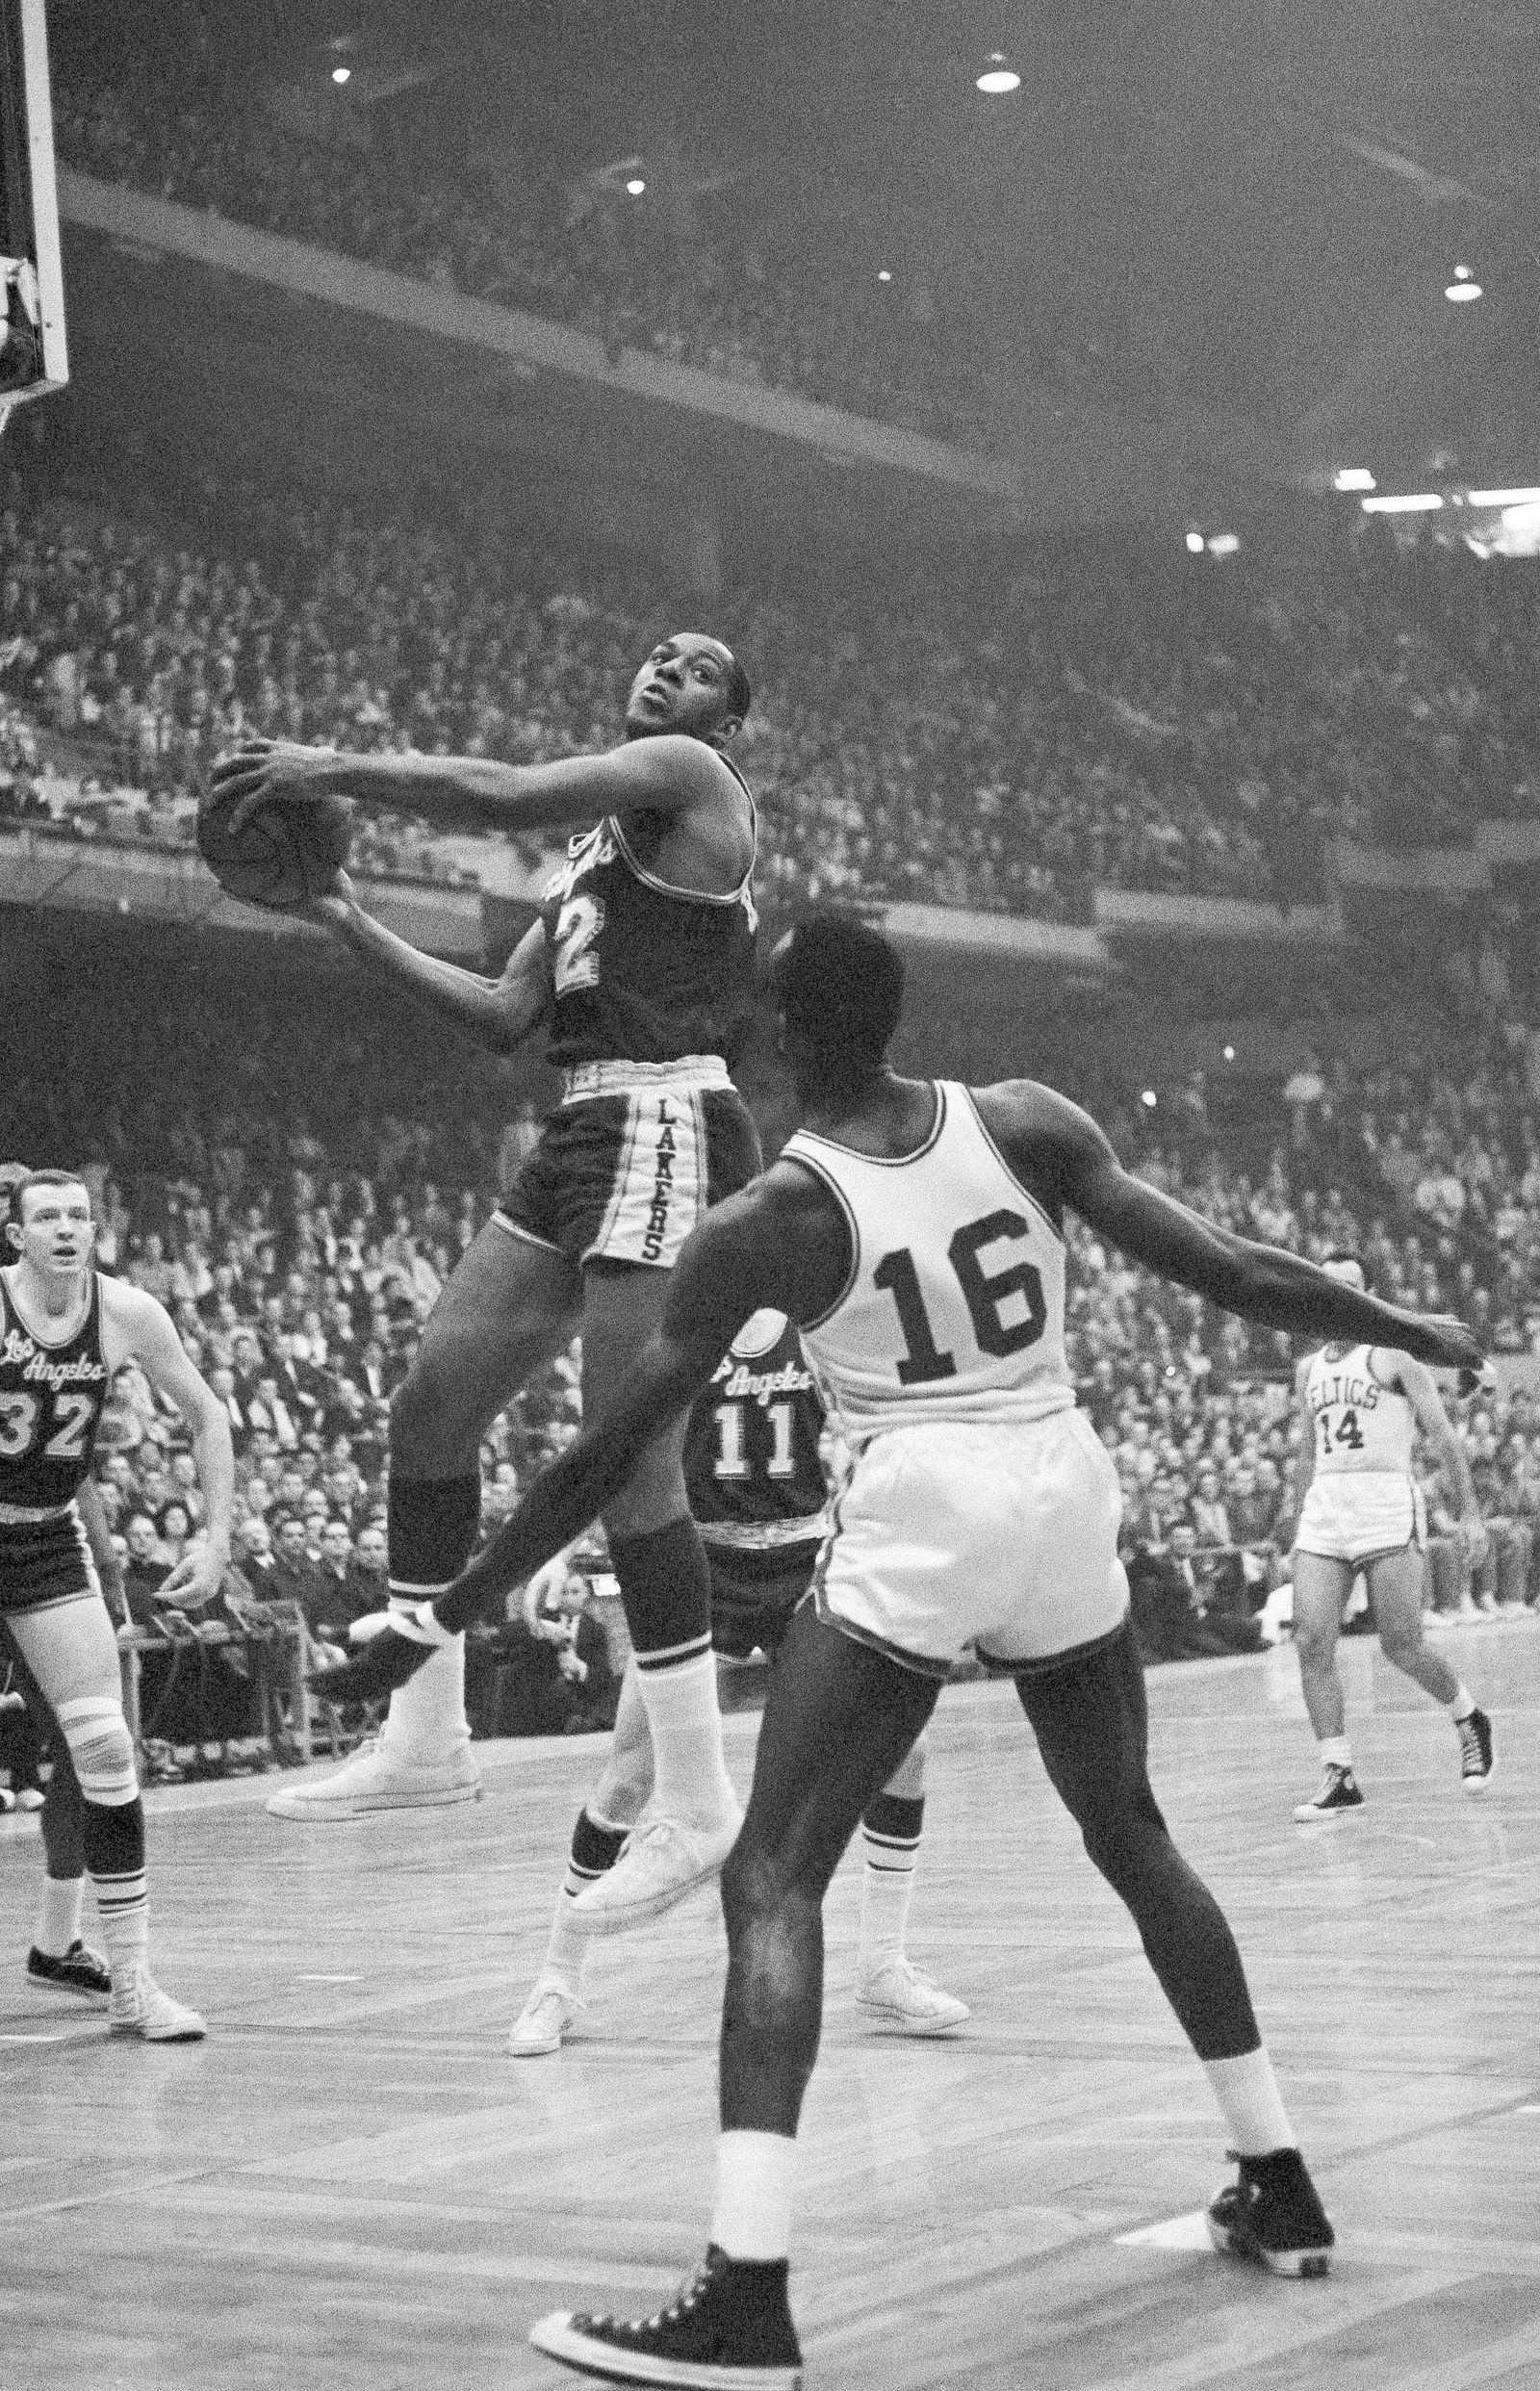 Watchf Associated Press Sports NBA Basketball Massachusett United States APHS49419 LAKERS CELTICS BASKETBALL